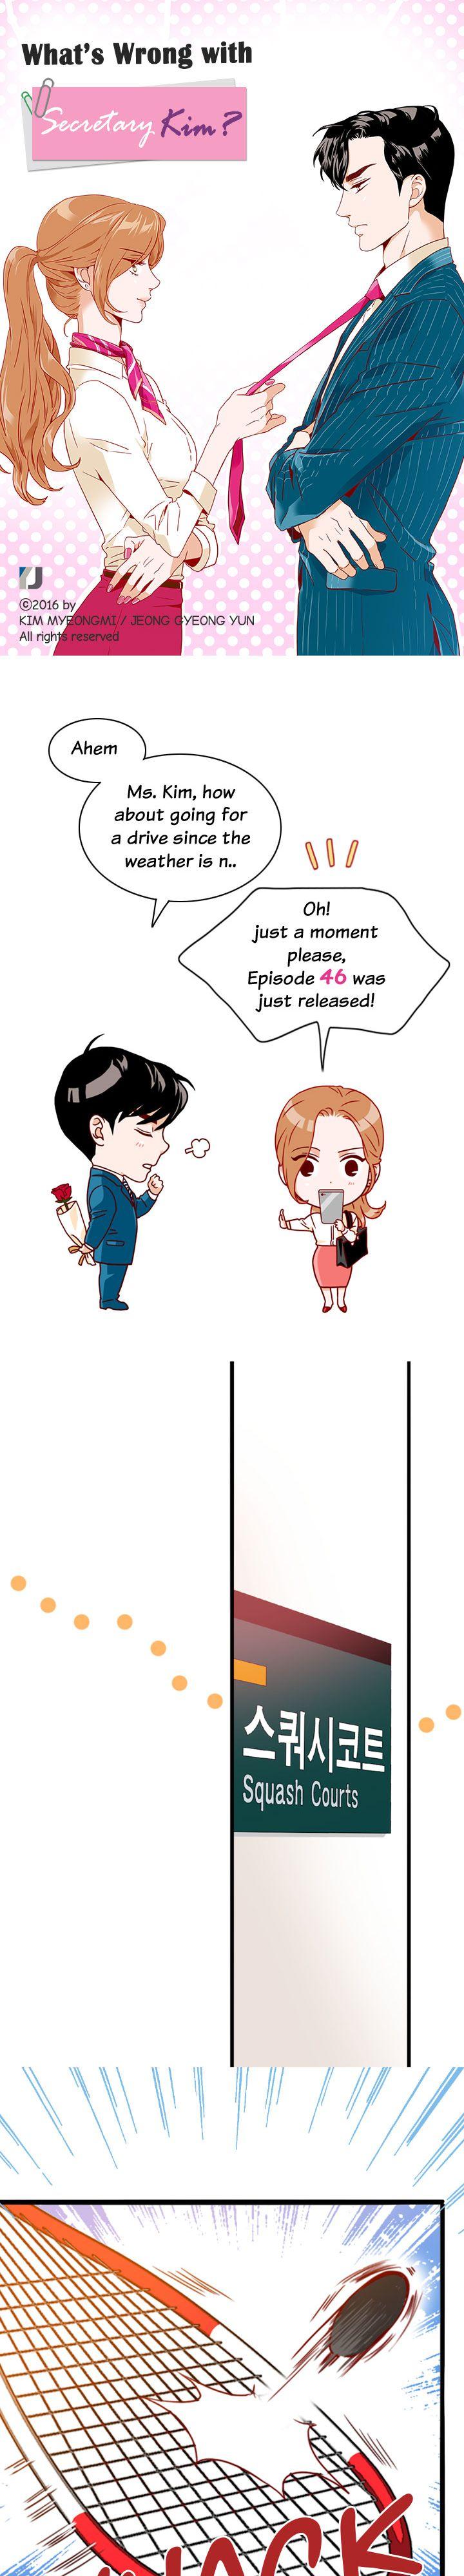 https://manga.mangadogs.com/comics/pic2/15/25807/960703/913ba89c8ec99c3d45e225791ce96d1d.jpg Page 1